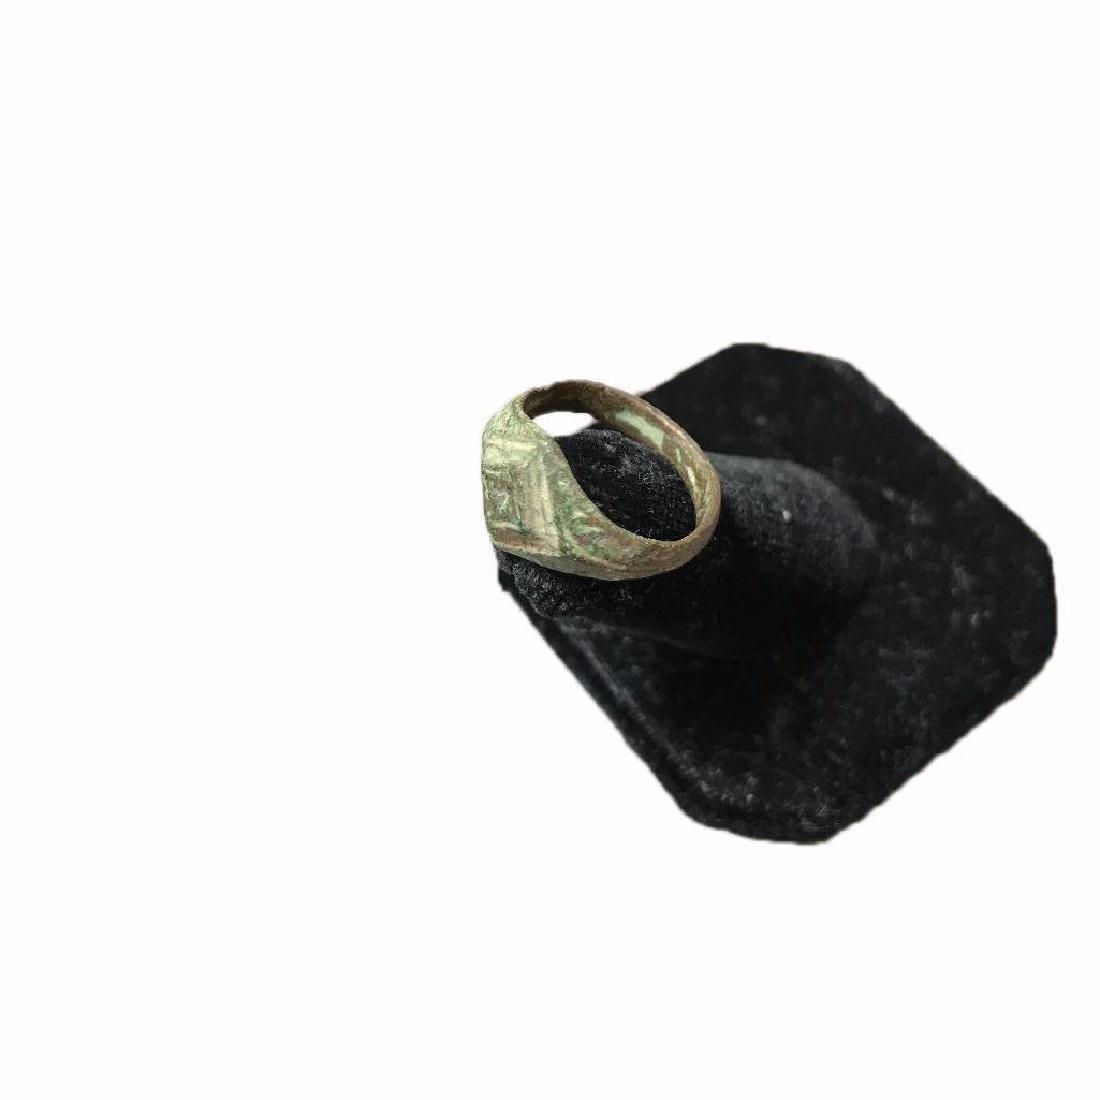 300-400 AD Ancient Roman Bronze Ring - 4